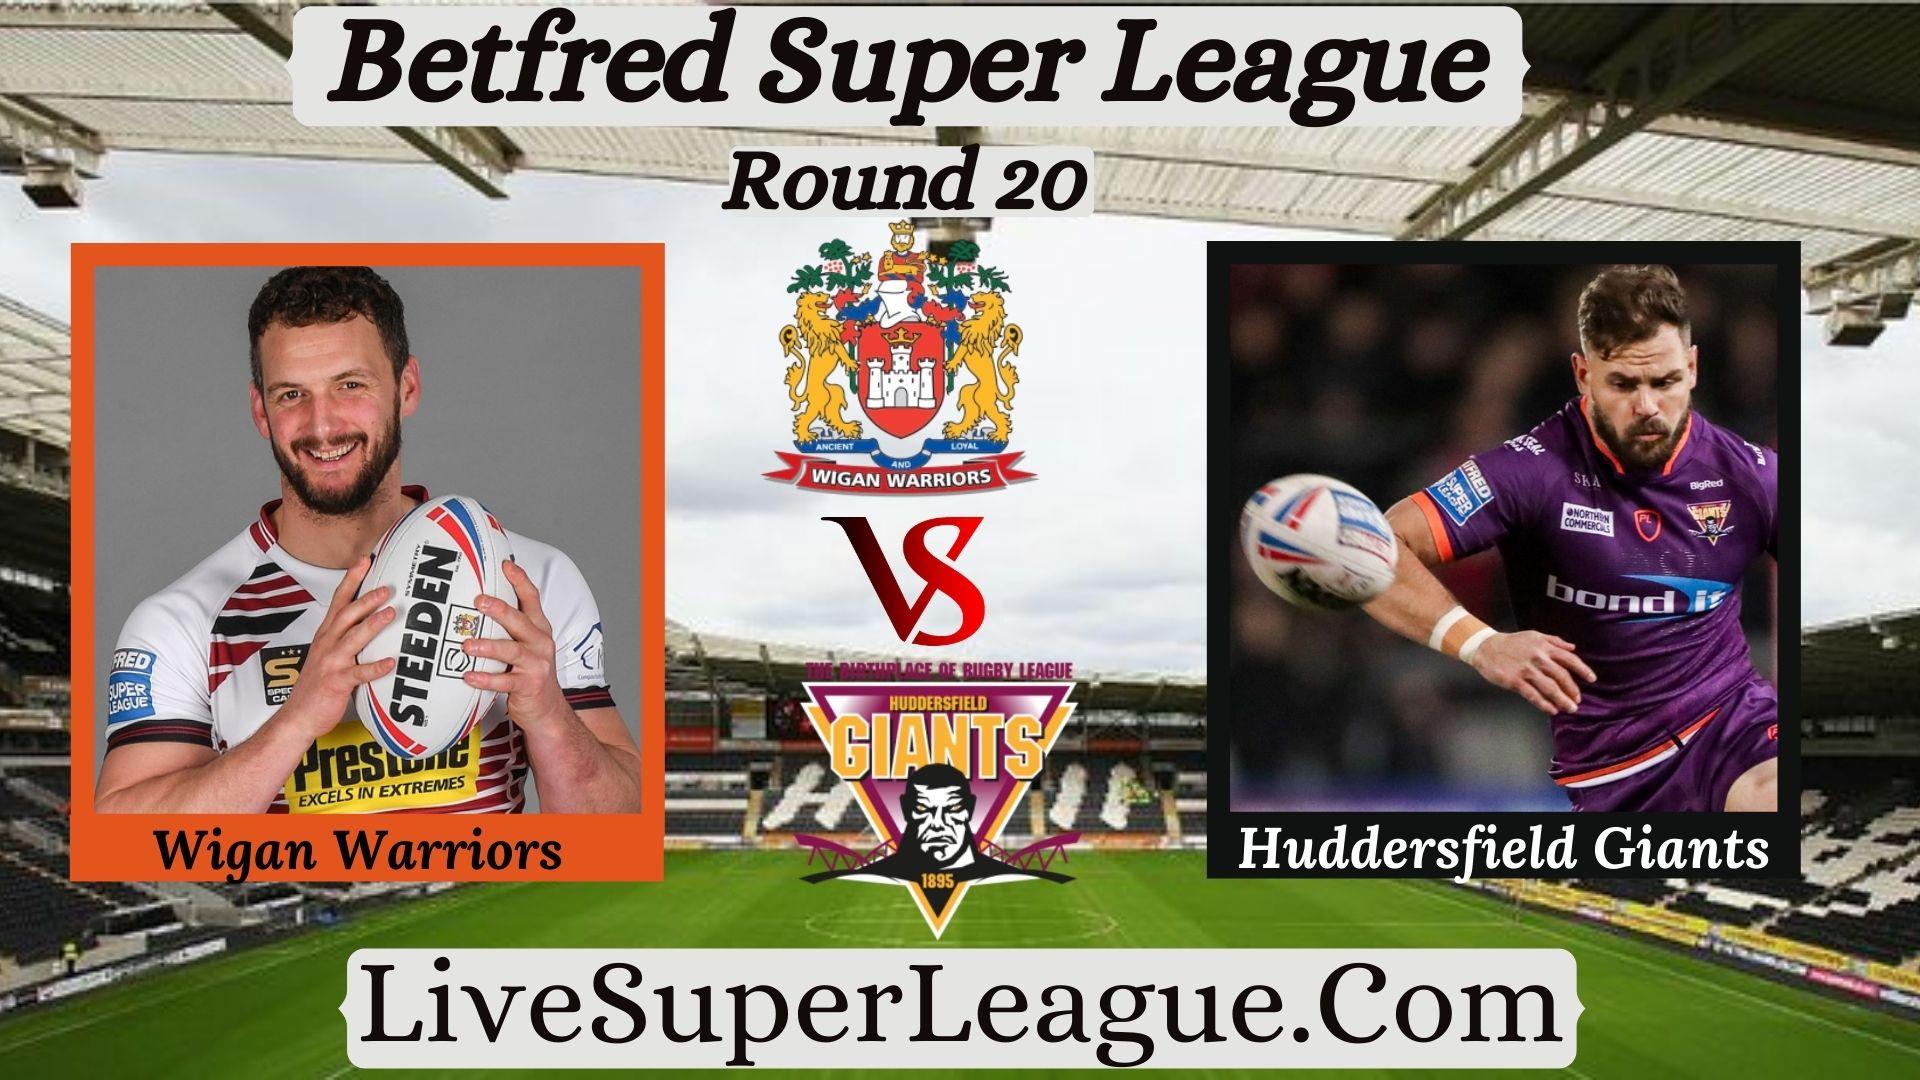 live-huddersfield-giants-vs-wigan-warriors-telecast